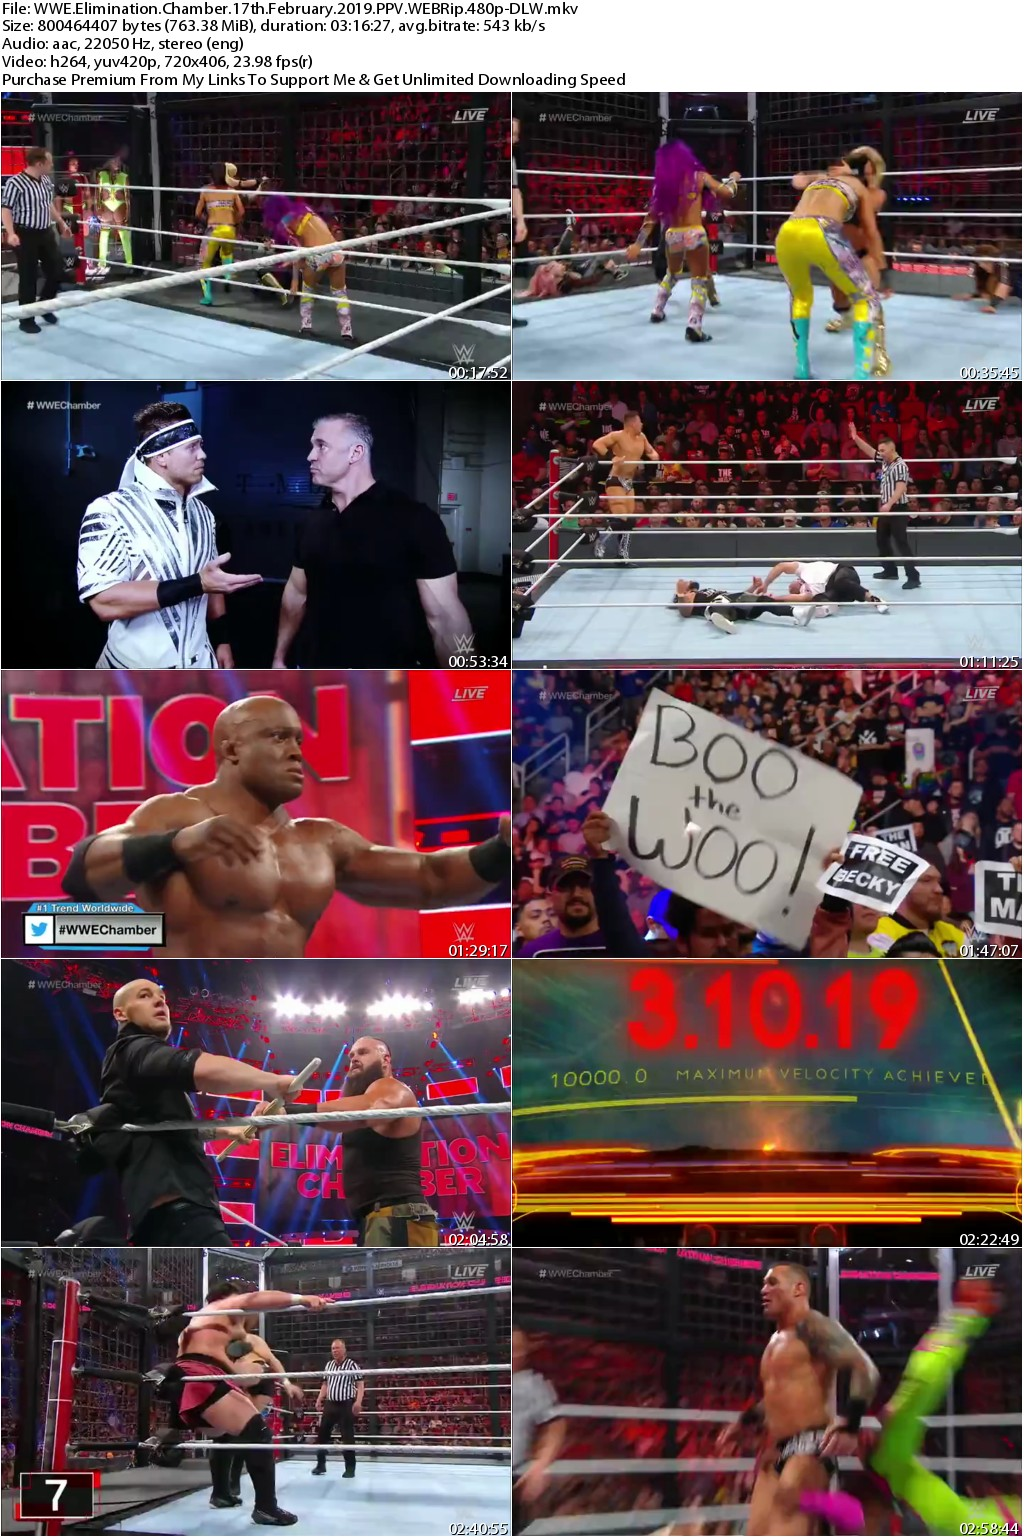 WWE Elimination Chamber 17th February 2019 PPV WEBRip 480p-DLW